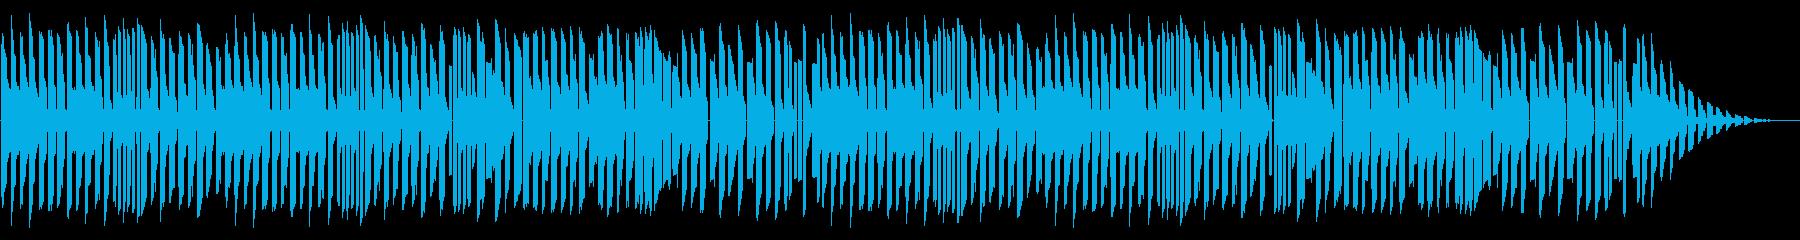 NES RPG B04-1(街2) の再生済みの波形